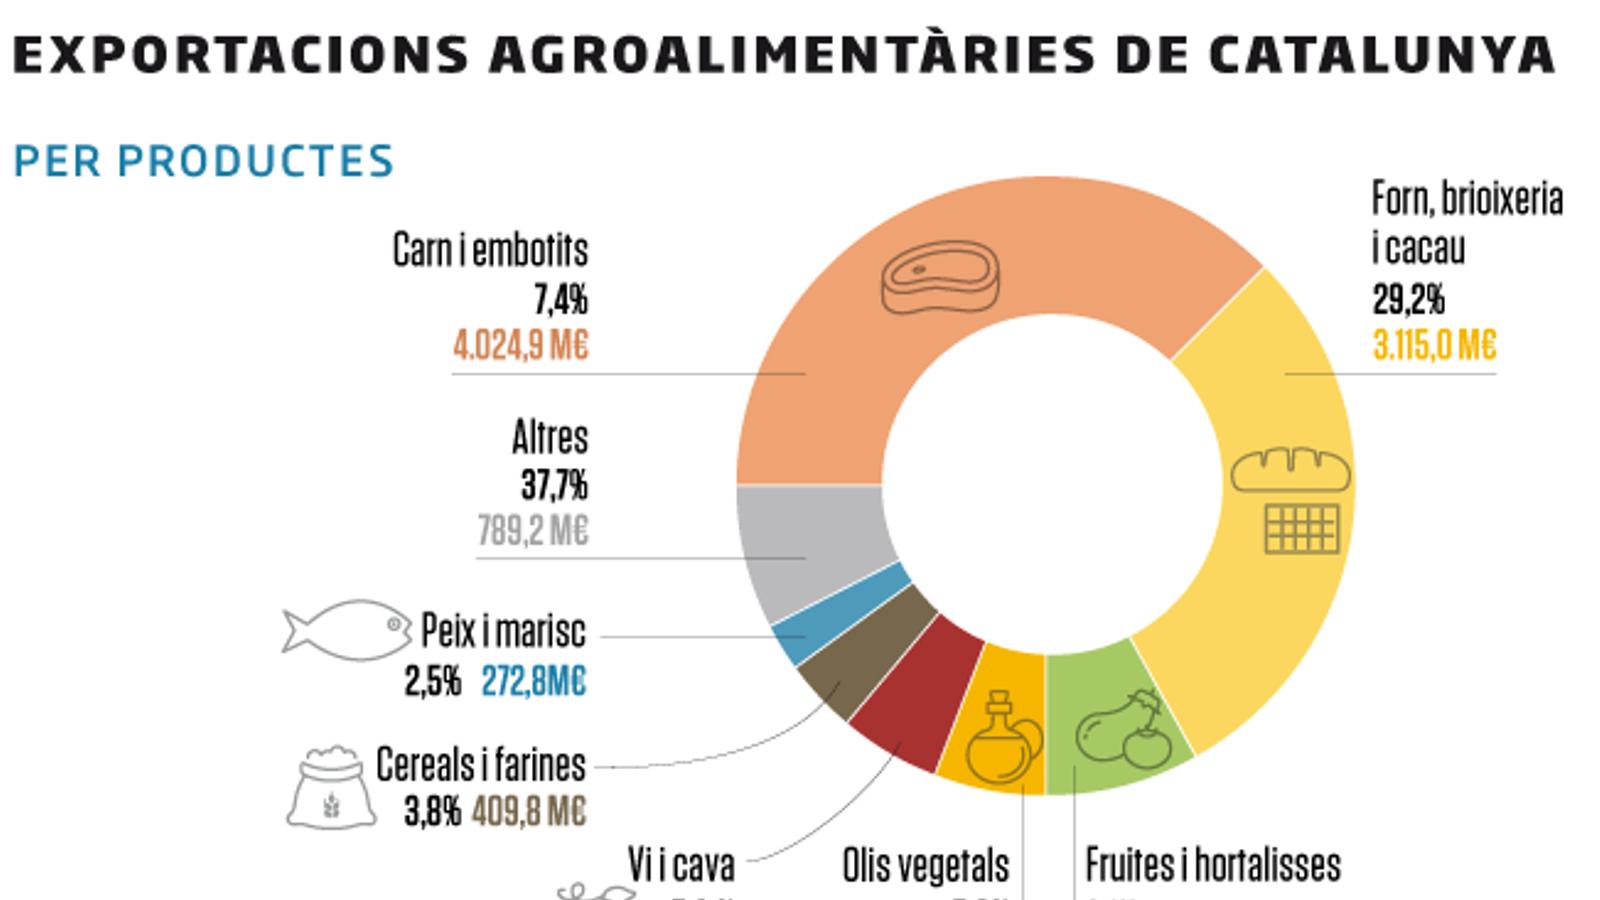 WEB-Exp.-agroalimentaries-CAT